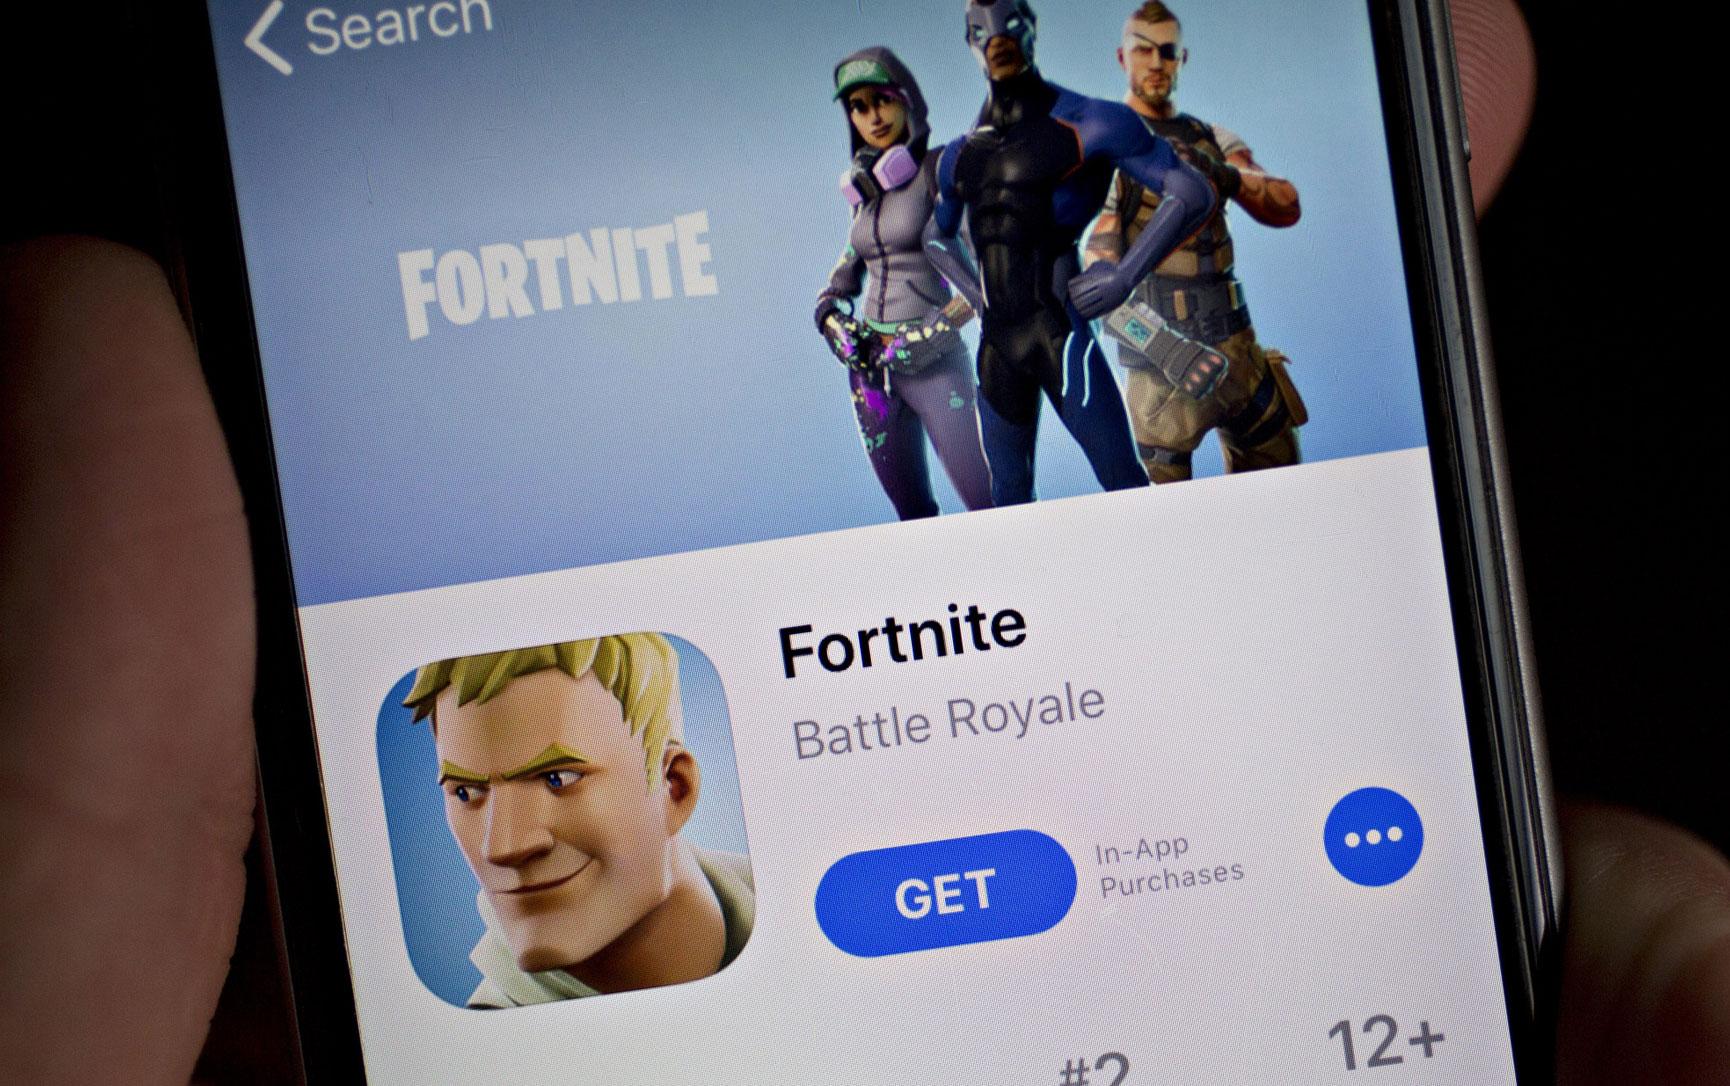 Apple tells Epic it won't allow Fortnite back on the App Store until court verdict is final